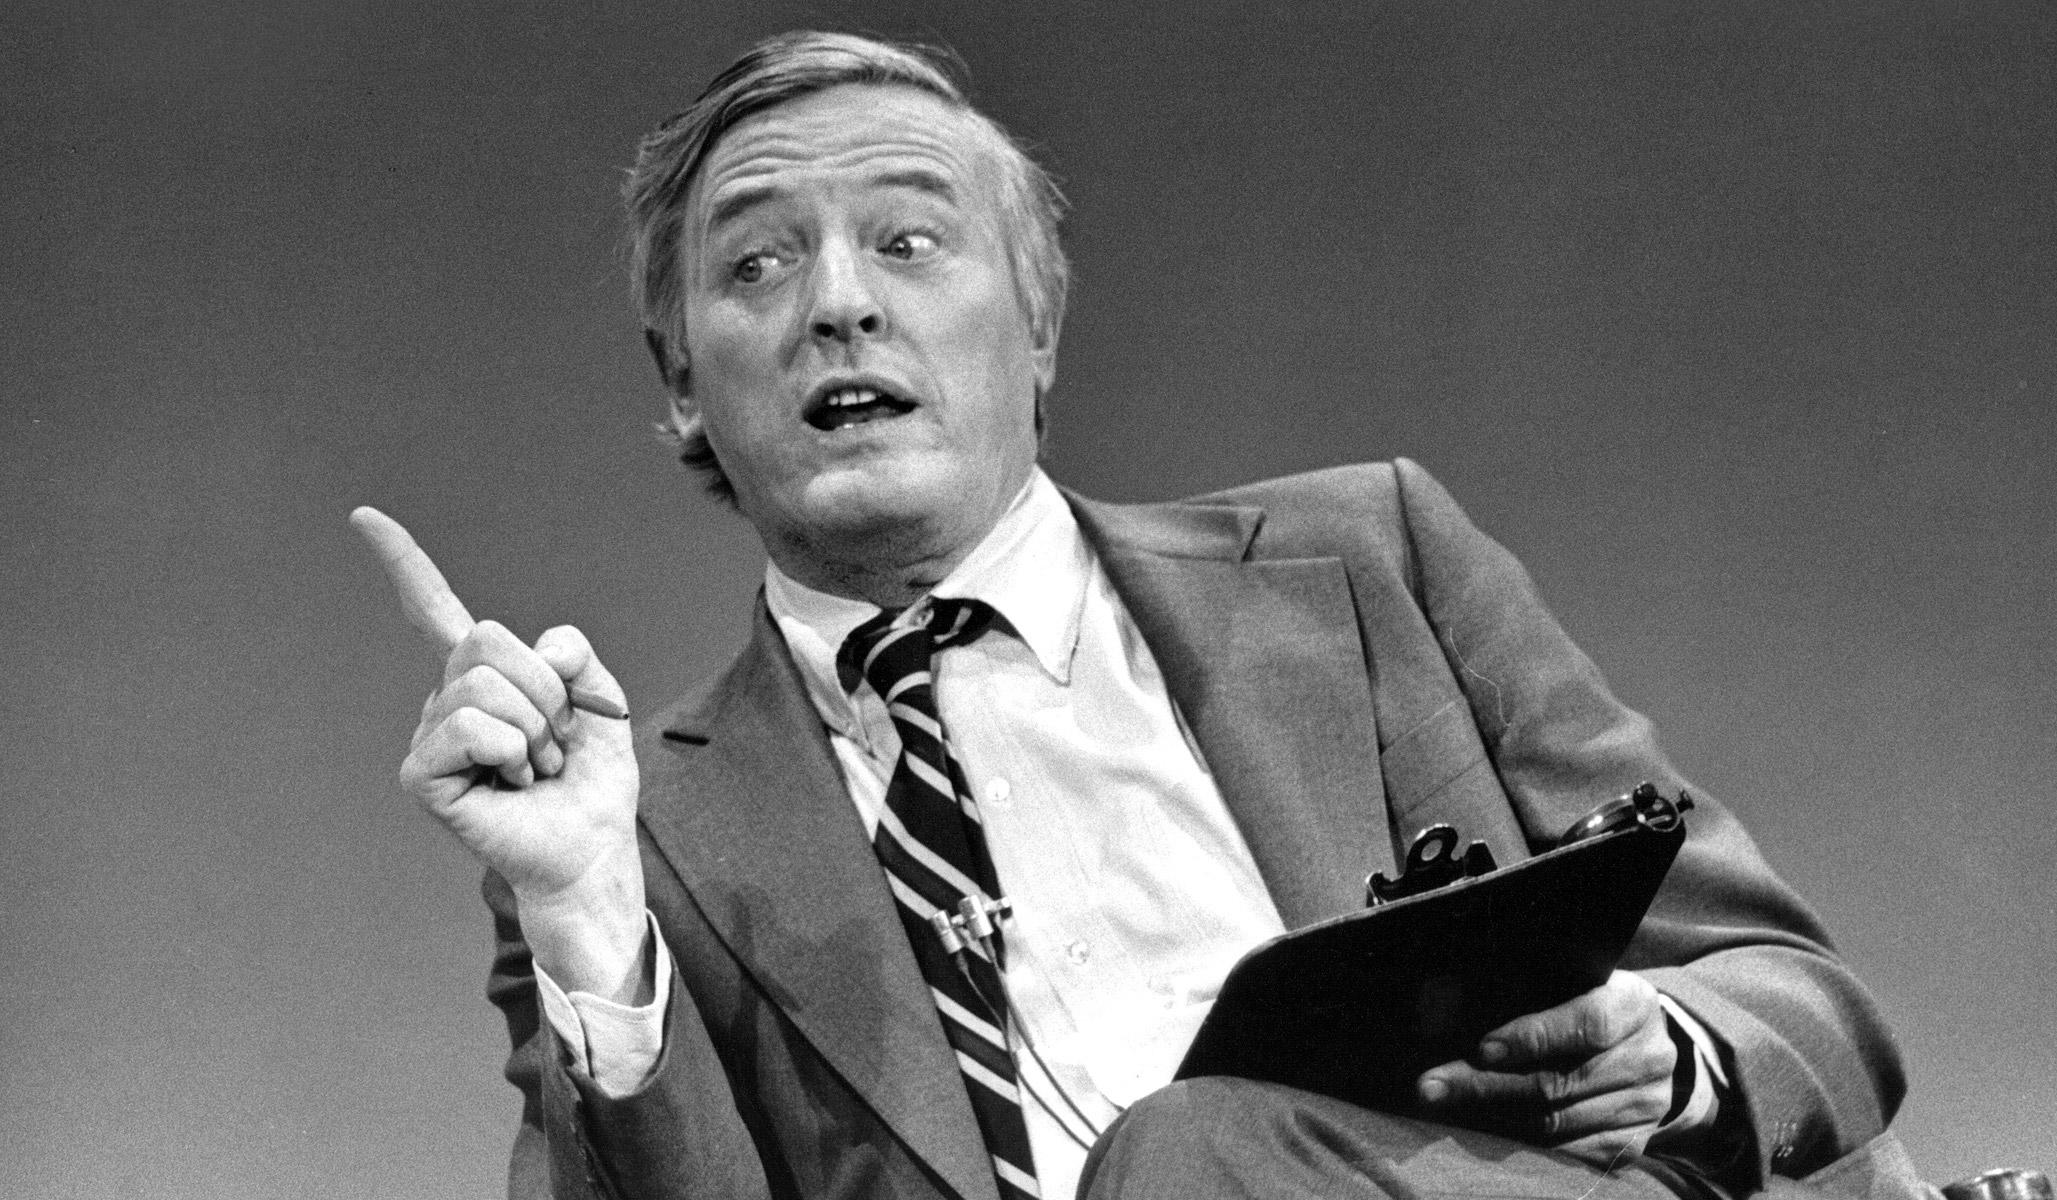 William F. Buckley Jr.: Lasting Legacies | National Review